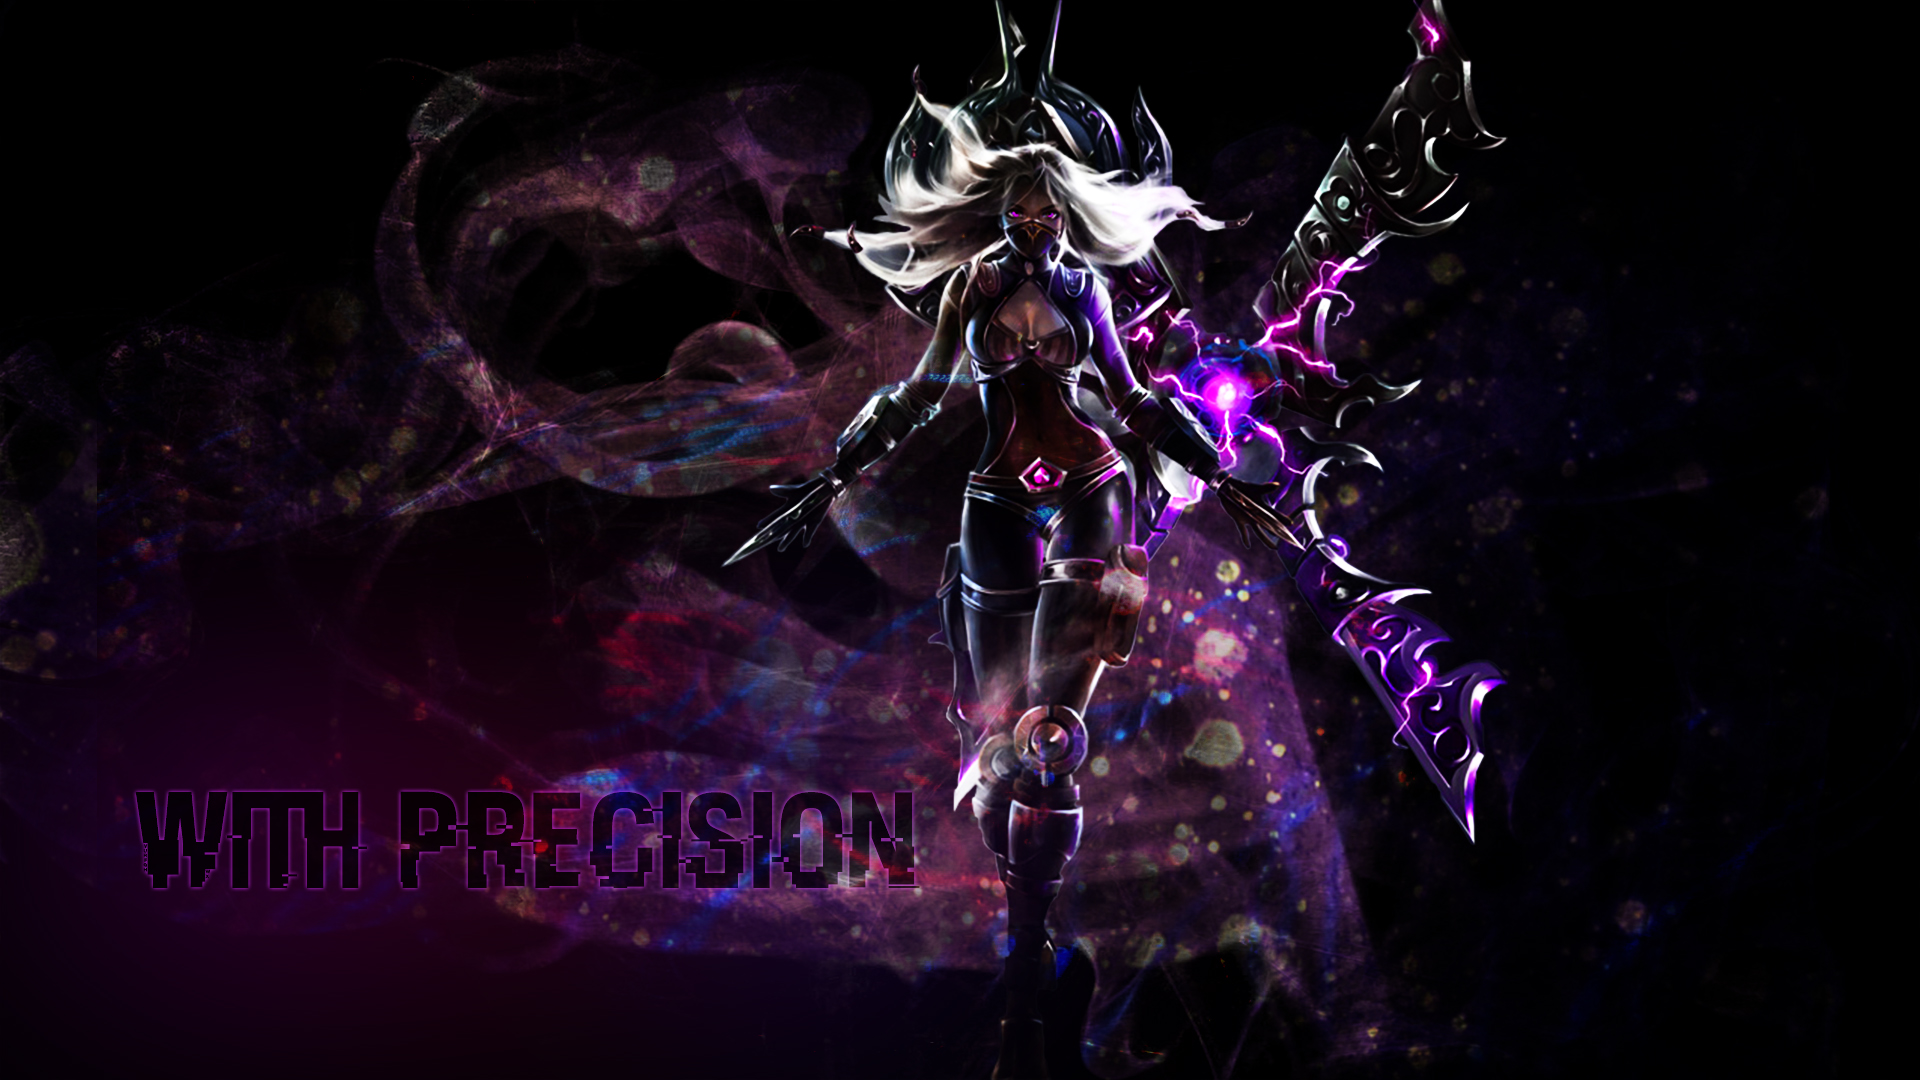 Nightblade Irelia by Churail on DeviantArt